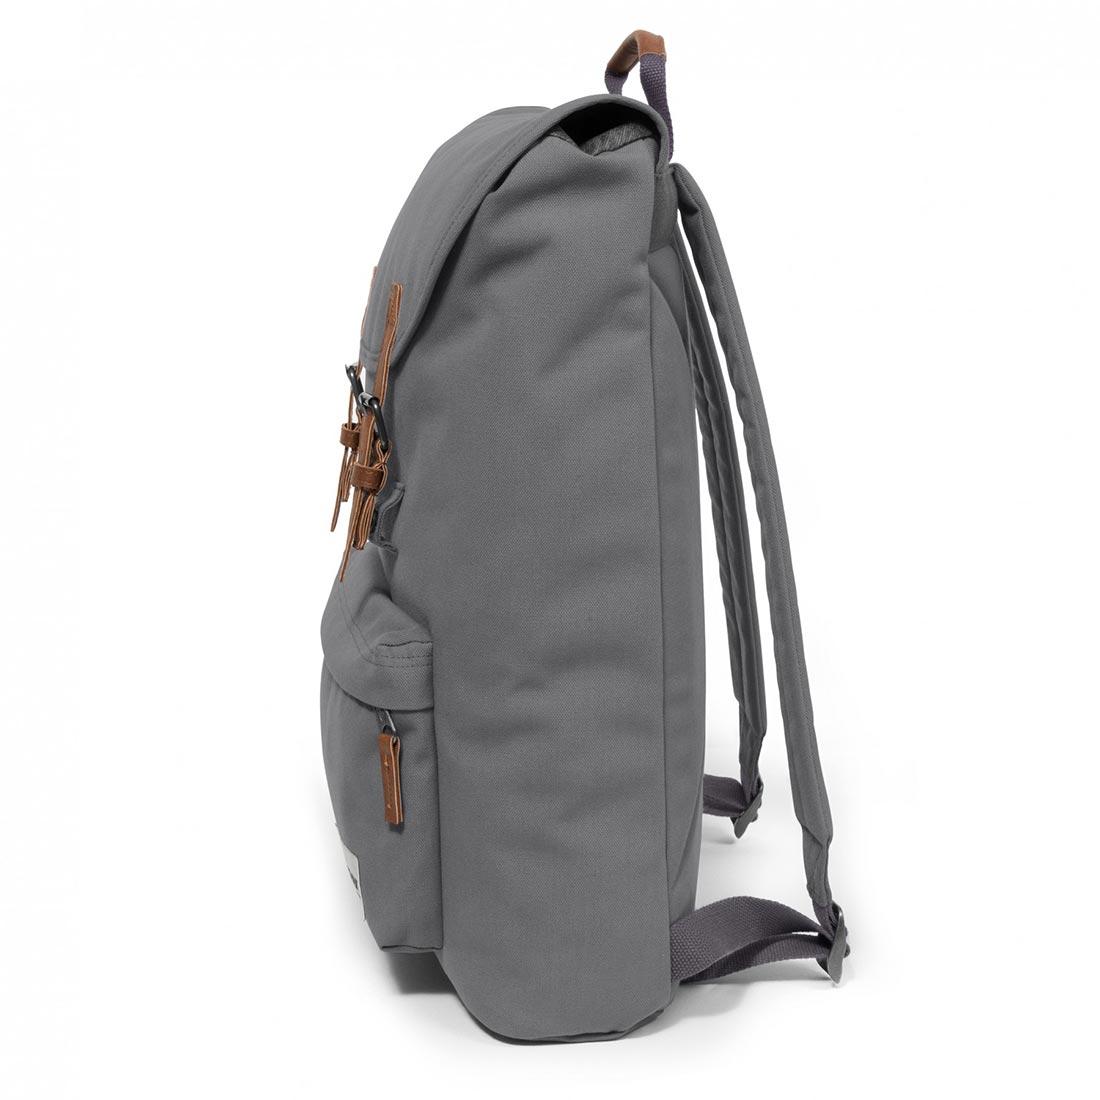 Eastpak London Backpack Mist